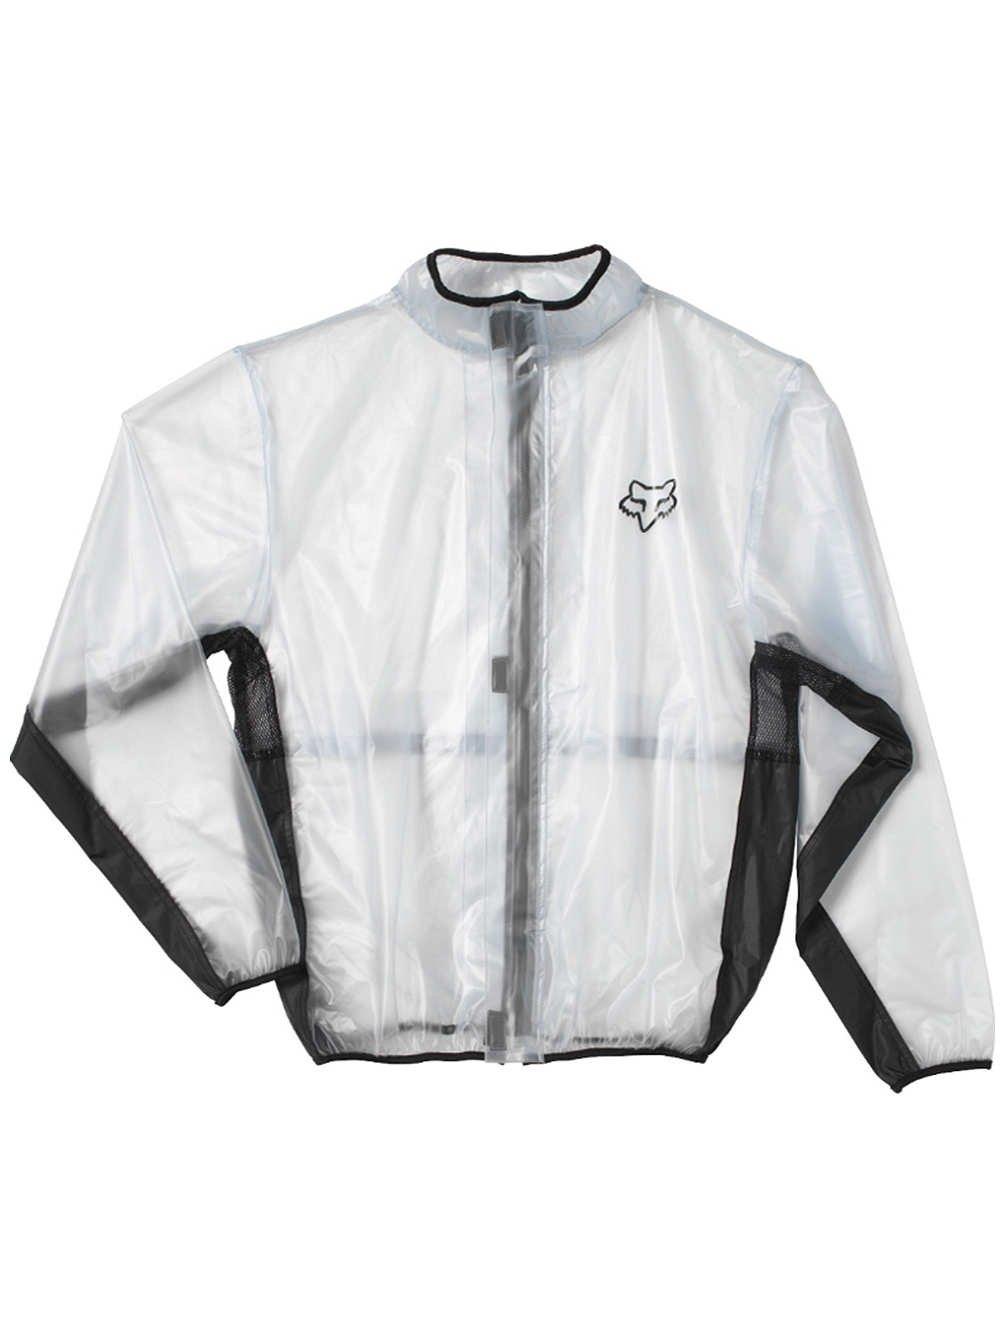 Amazon.com: Fox Racing 2019 Youth MX Fluid Jacket (MEDIUM) (CLEAR): Automotive